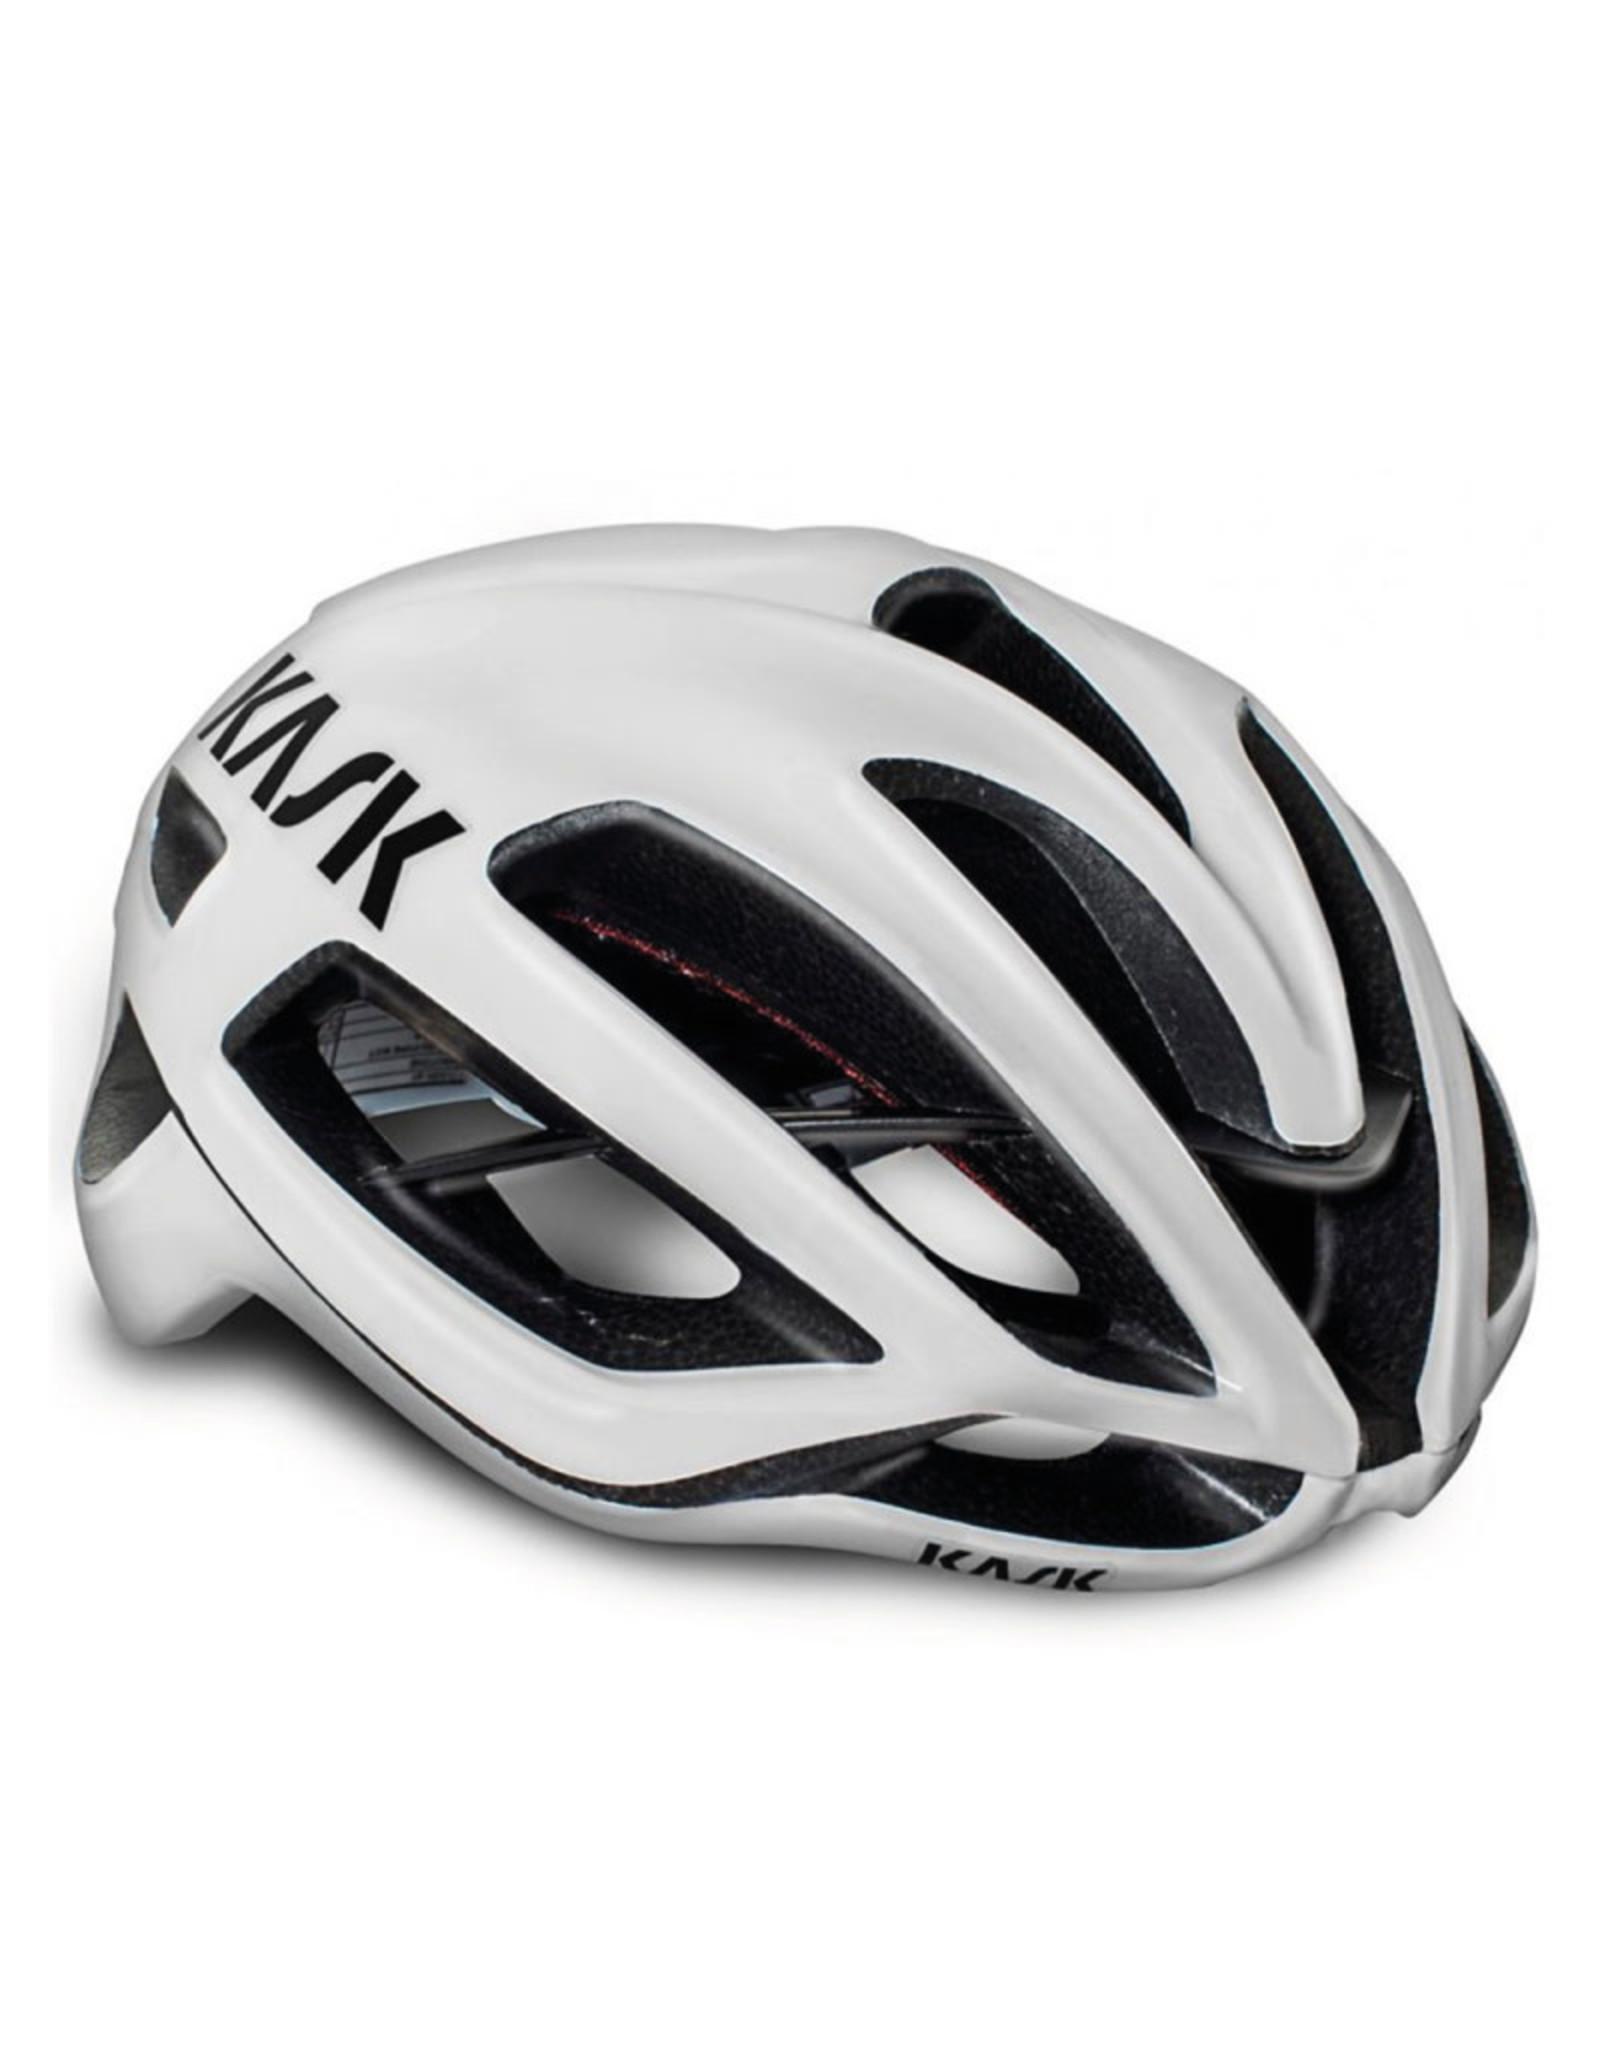 Kask Helmet Kask Protone White